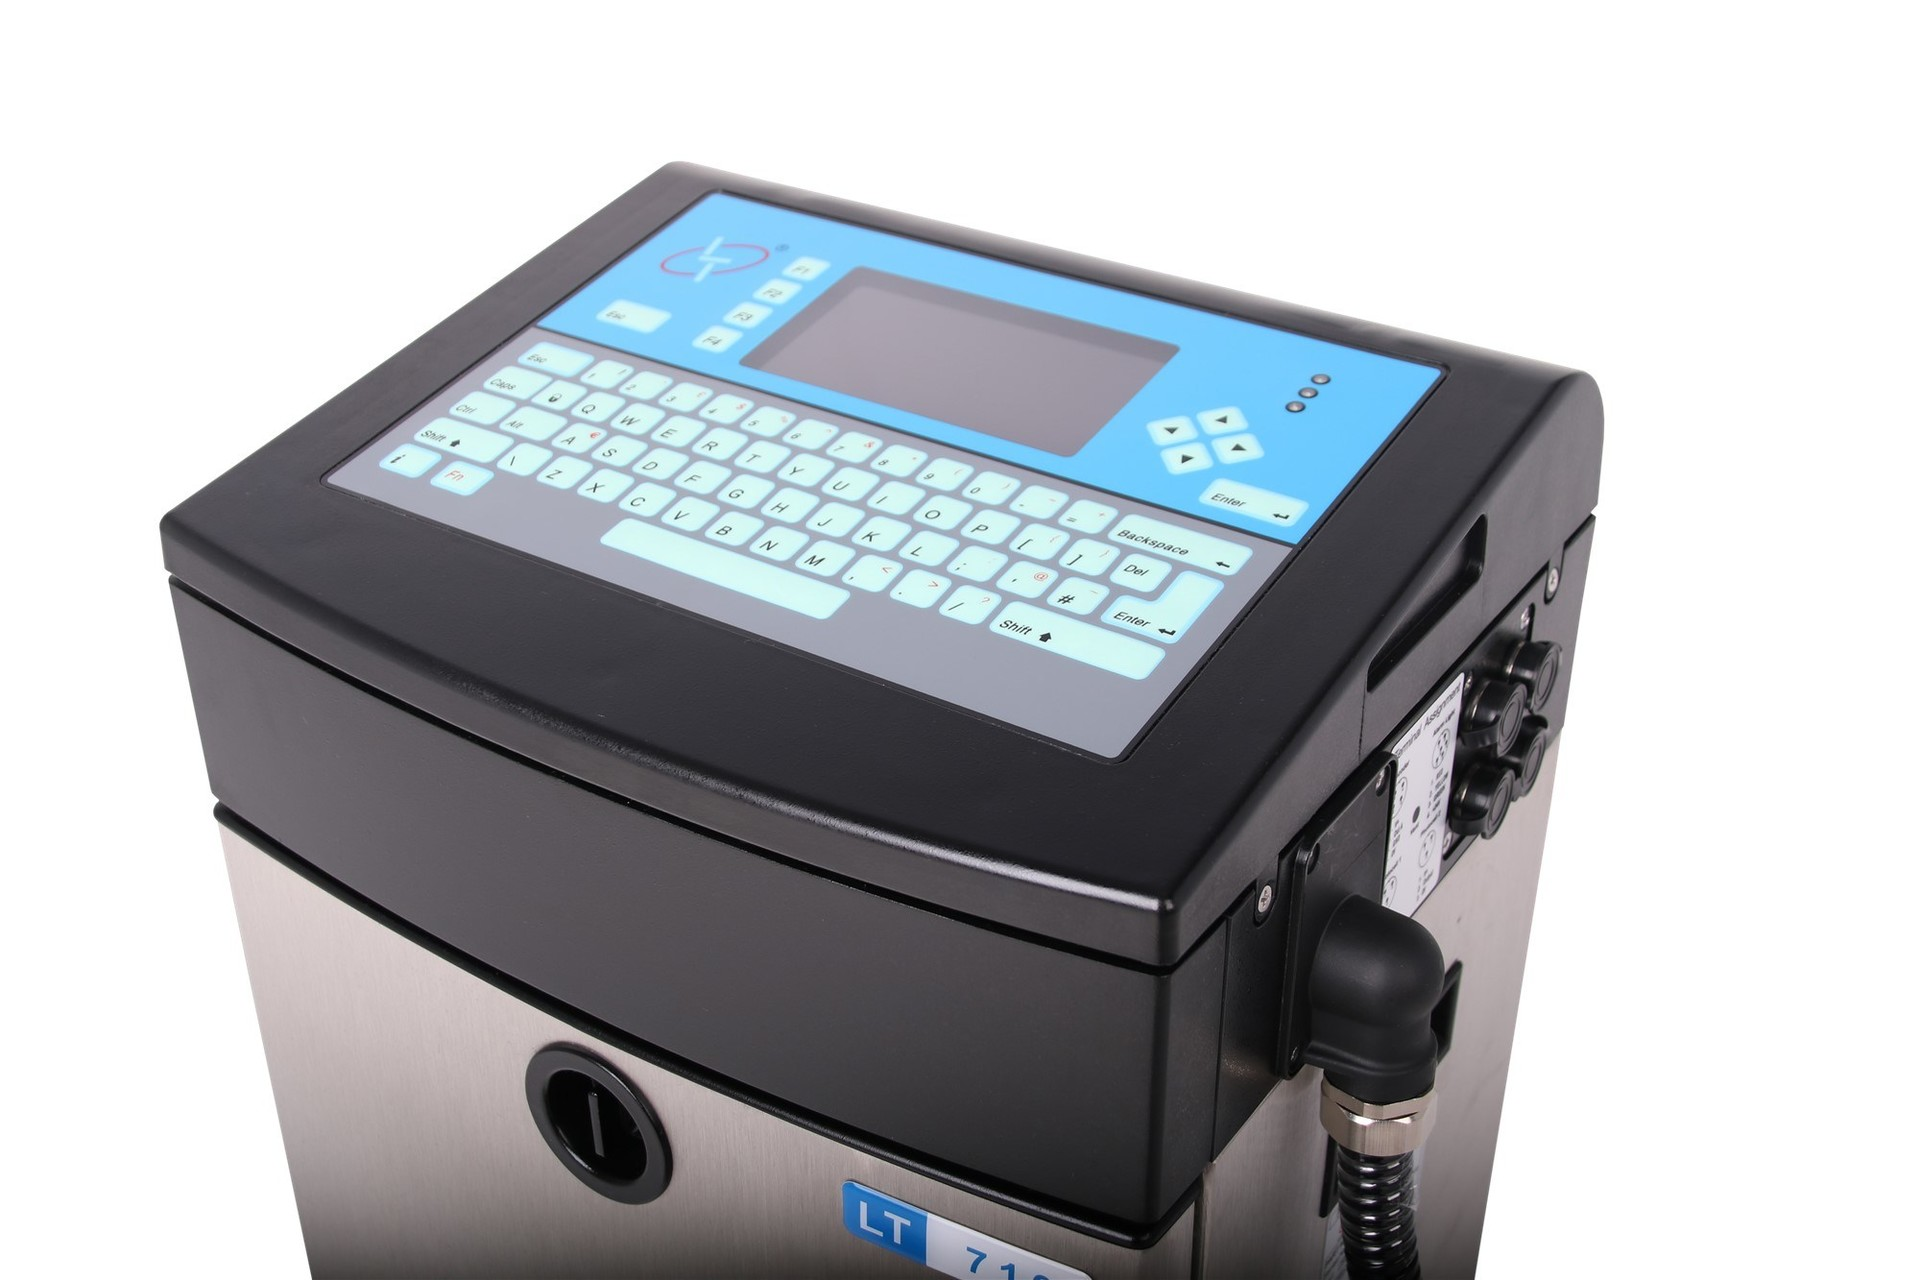 Lead Tech Lt710 Cij Inkjet Printer for PVC Pipe Coding